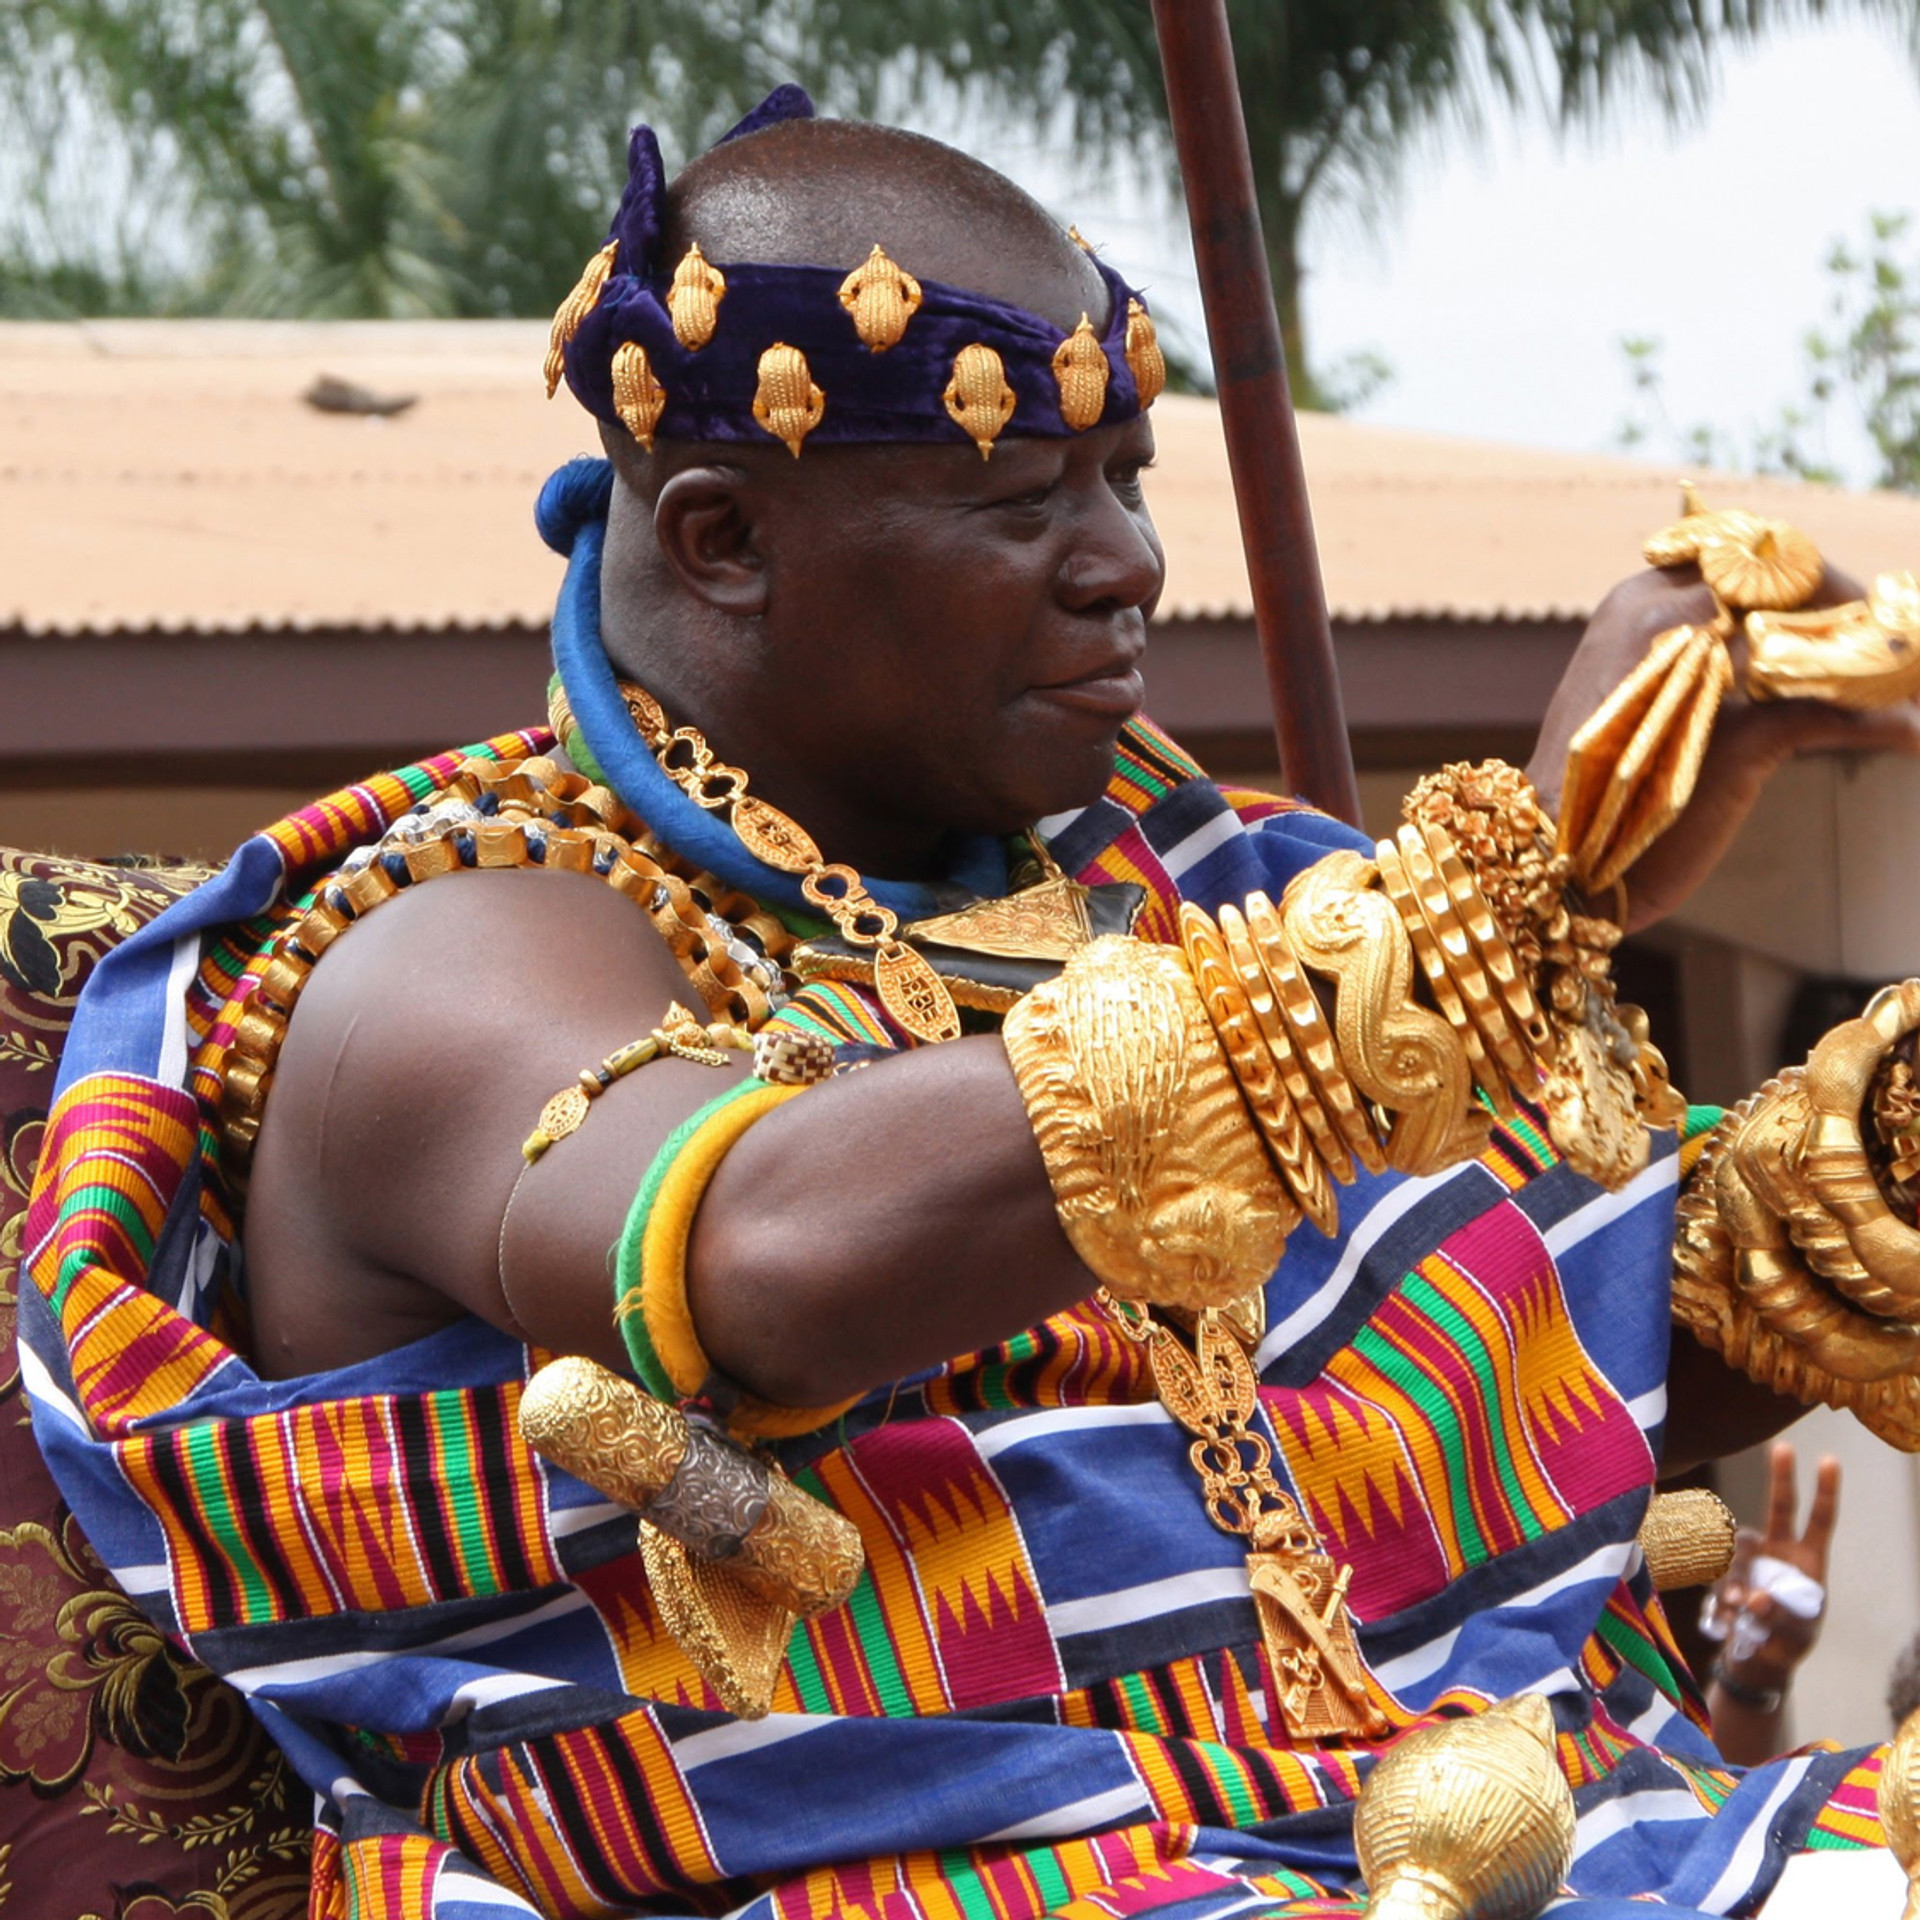 His Royal Majesty Otumfuo Osei Tutu II